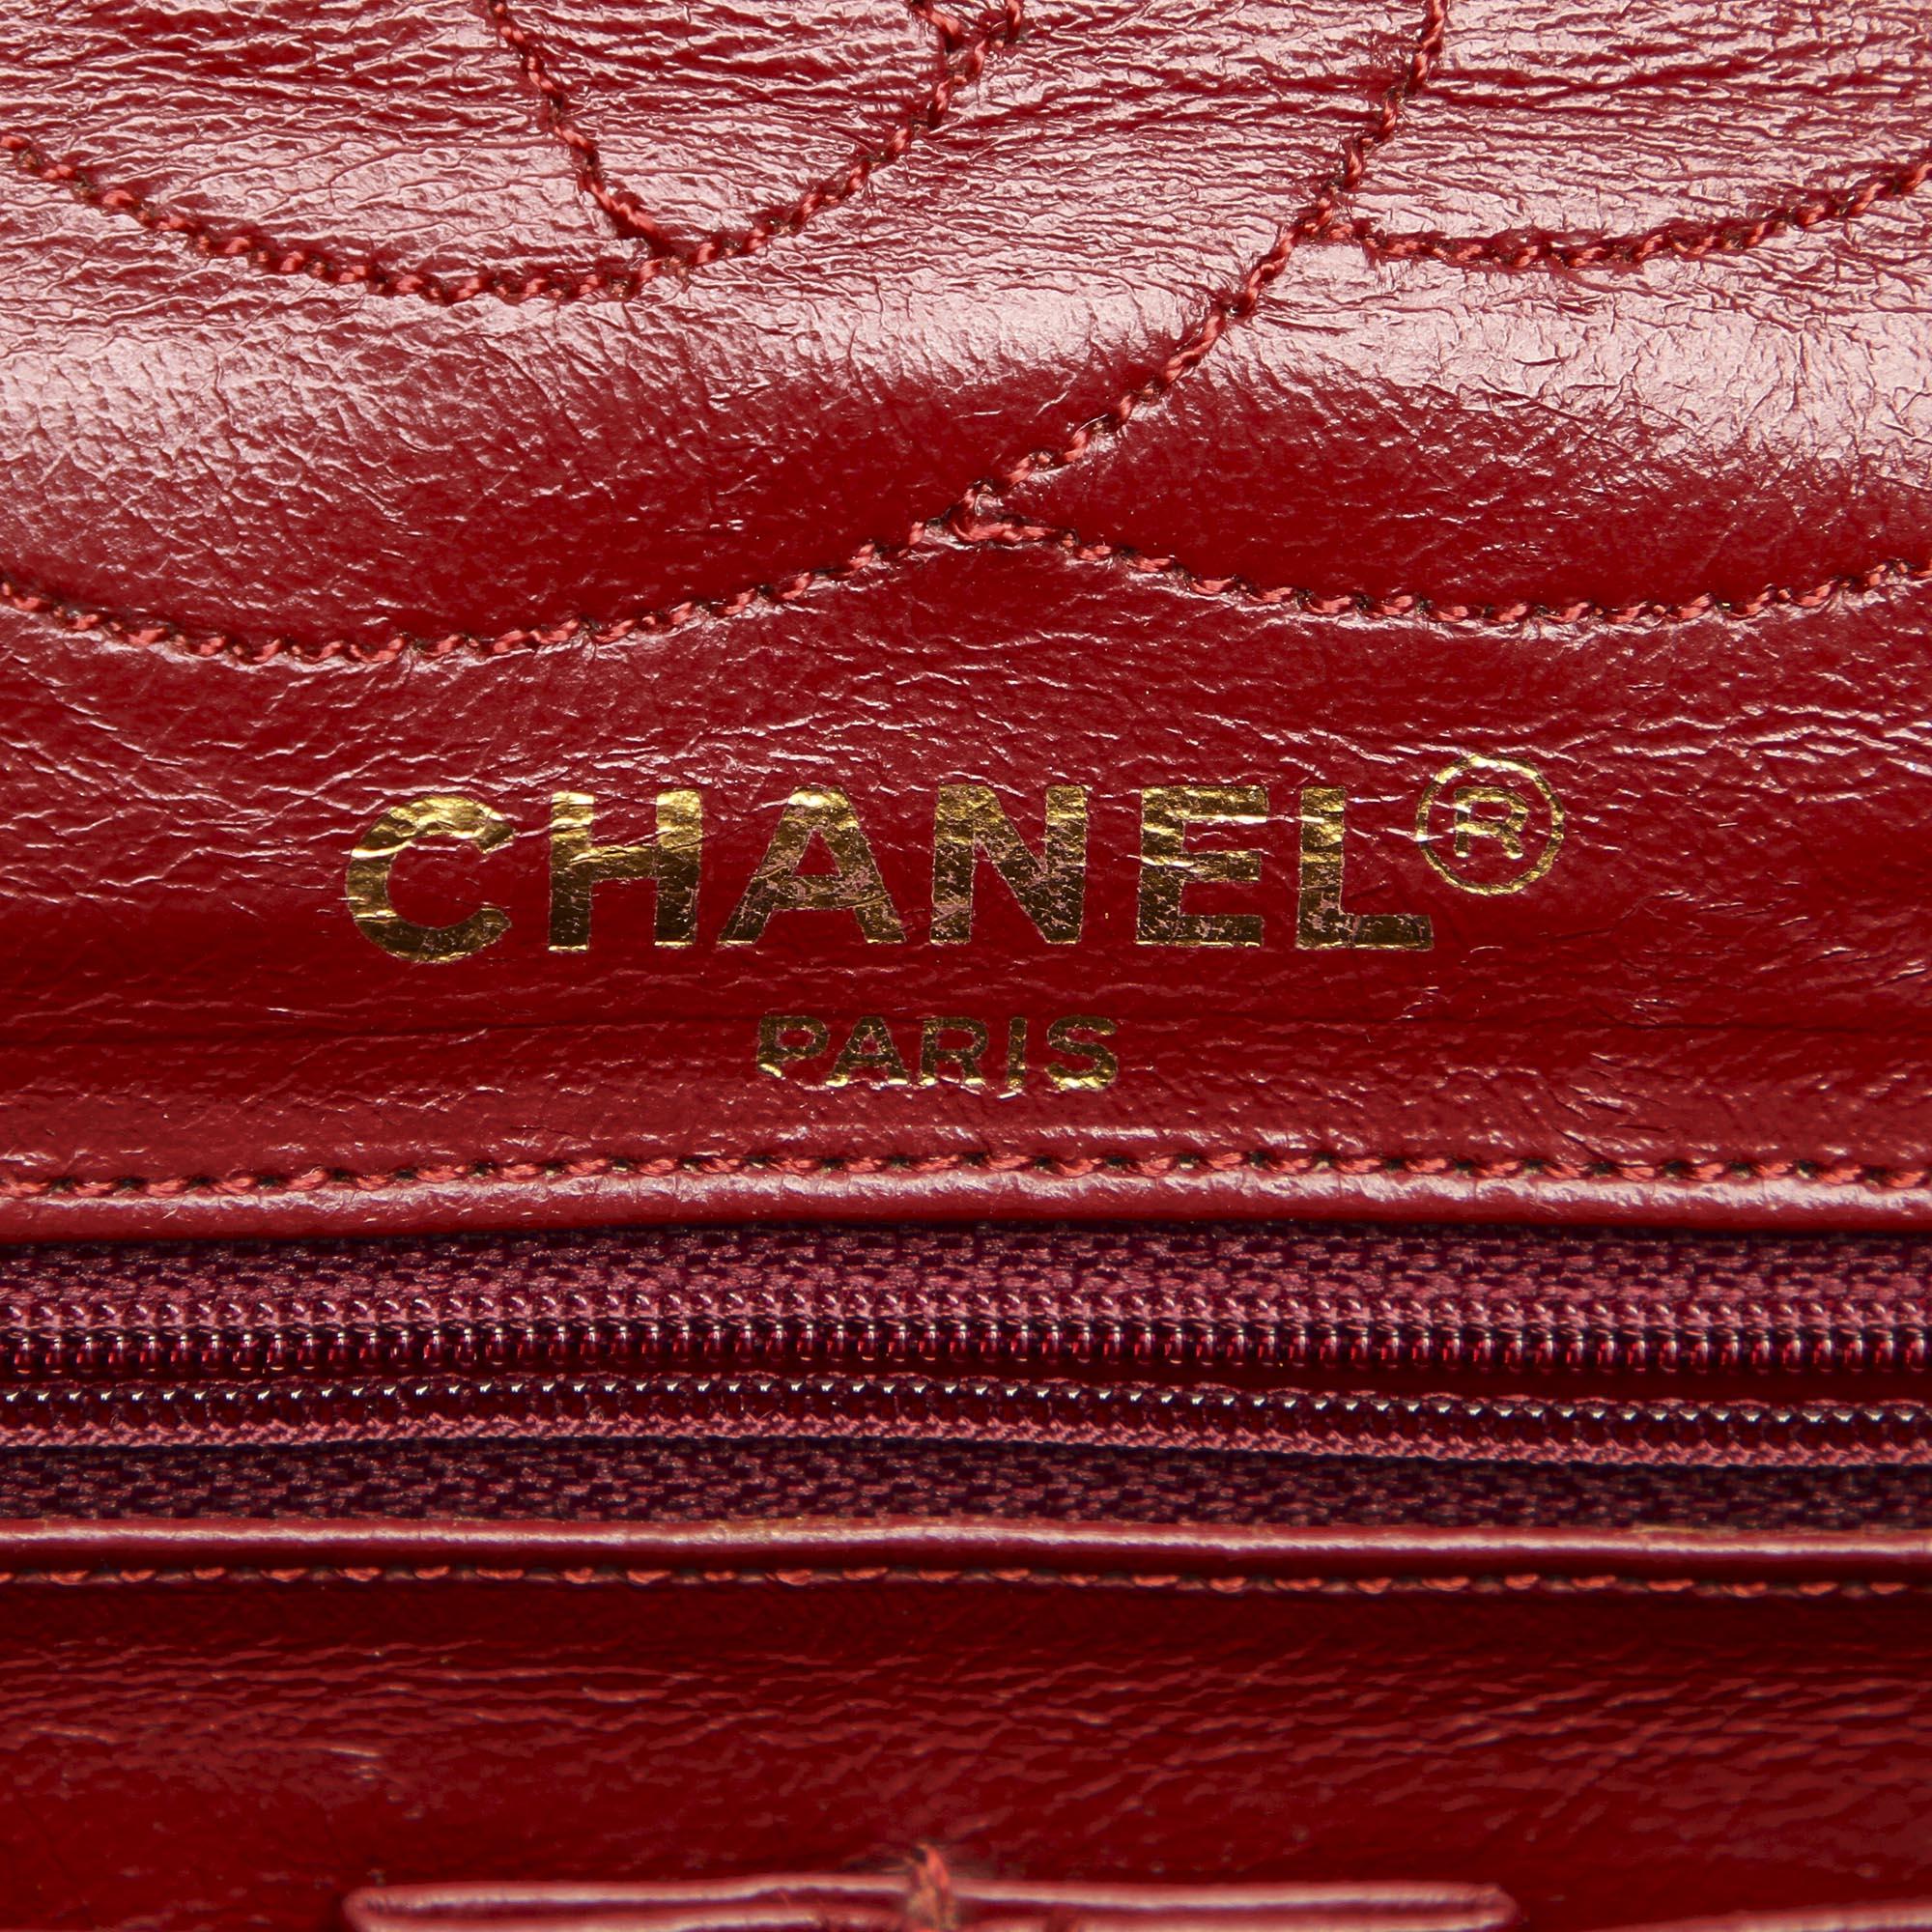 Chanel CC Lambskin Leather Flap Bag